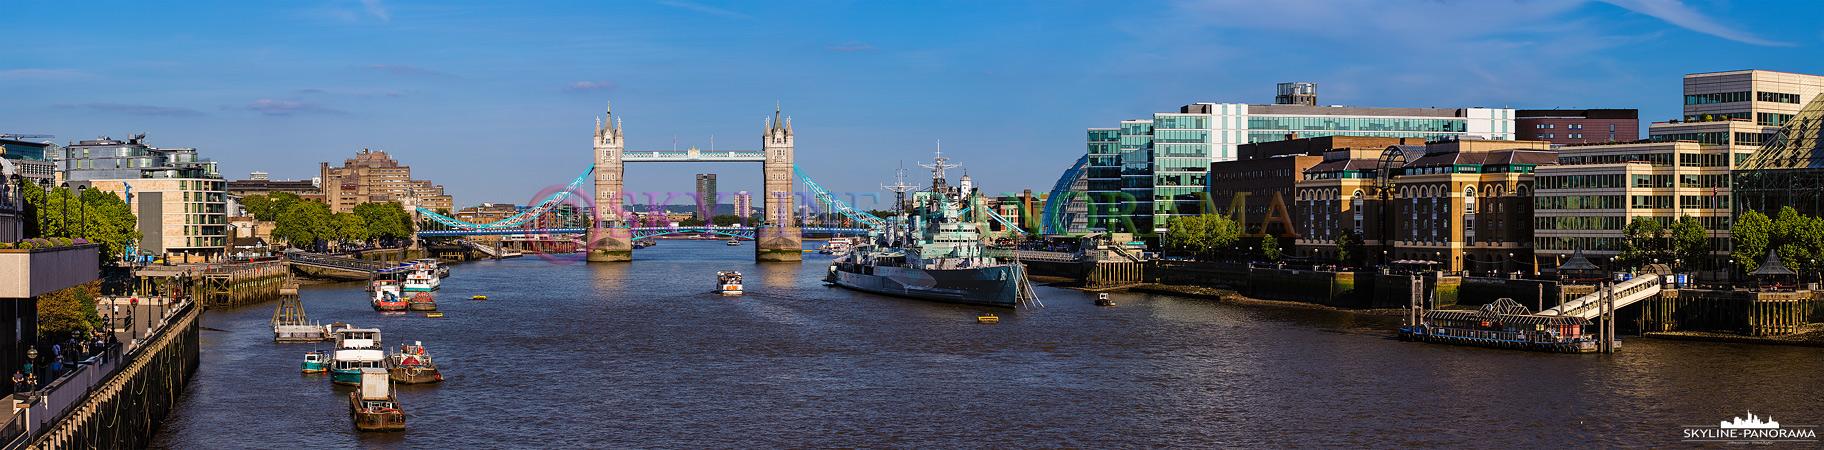 Panorama - London Bridge View